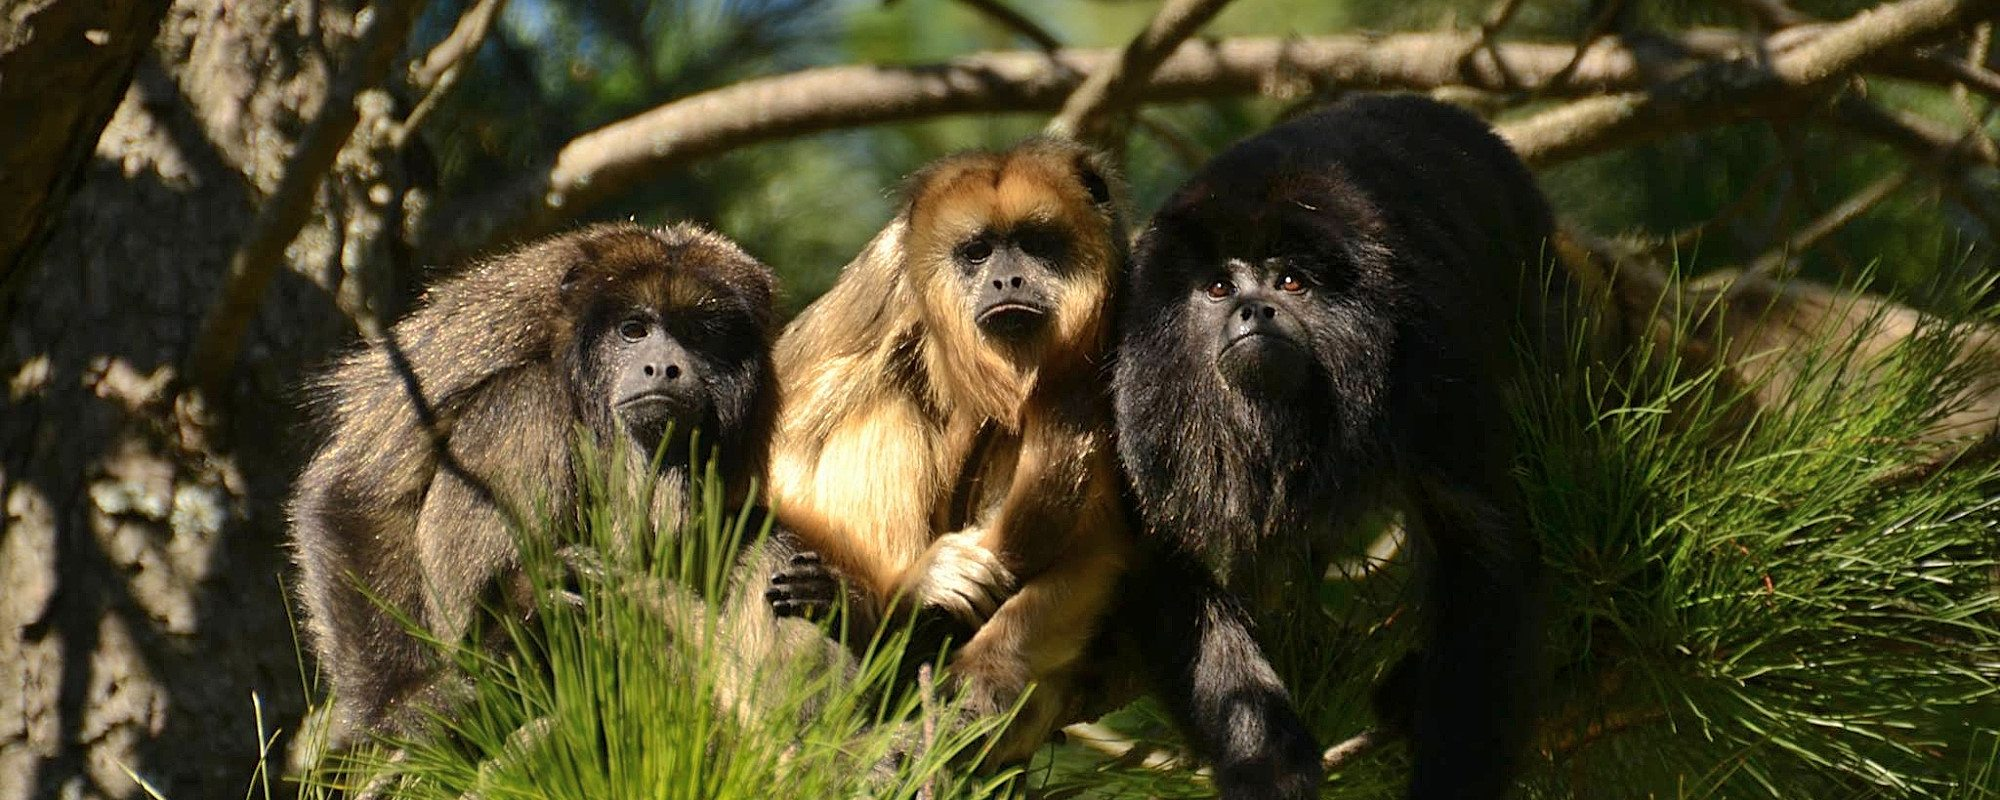 Rescued Howler monkeys